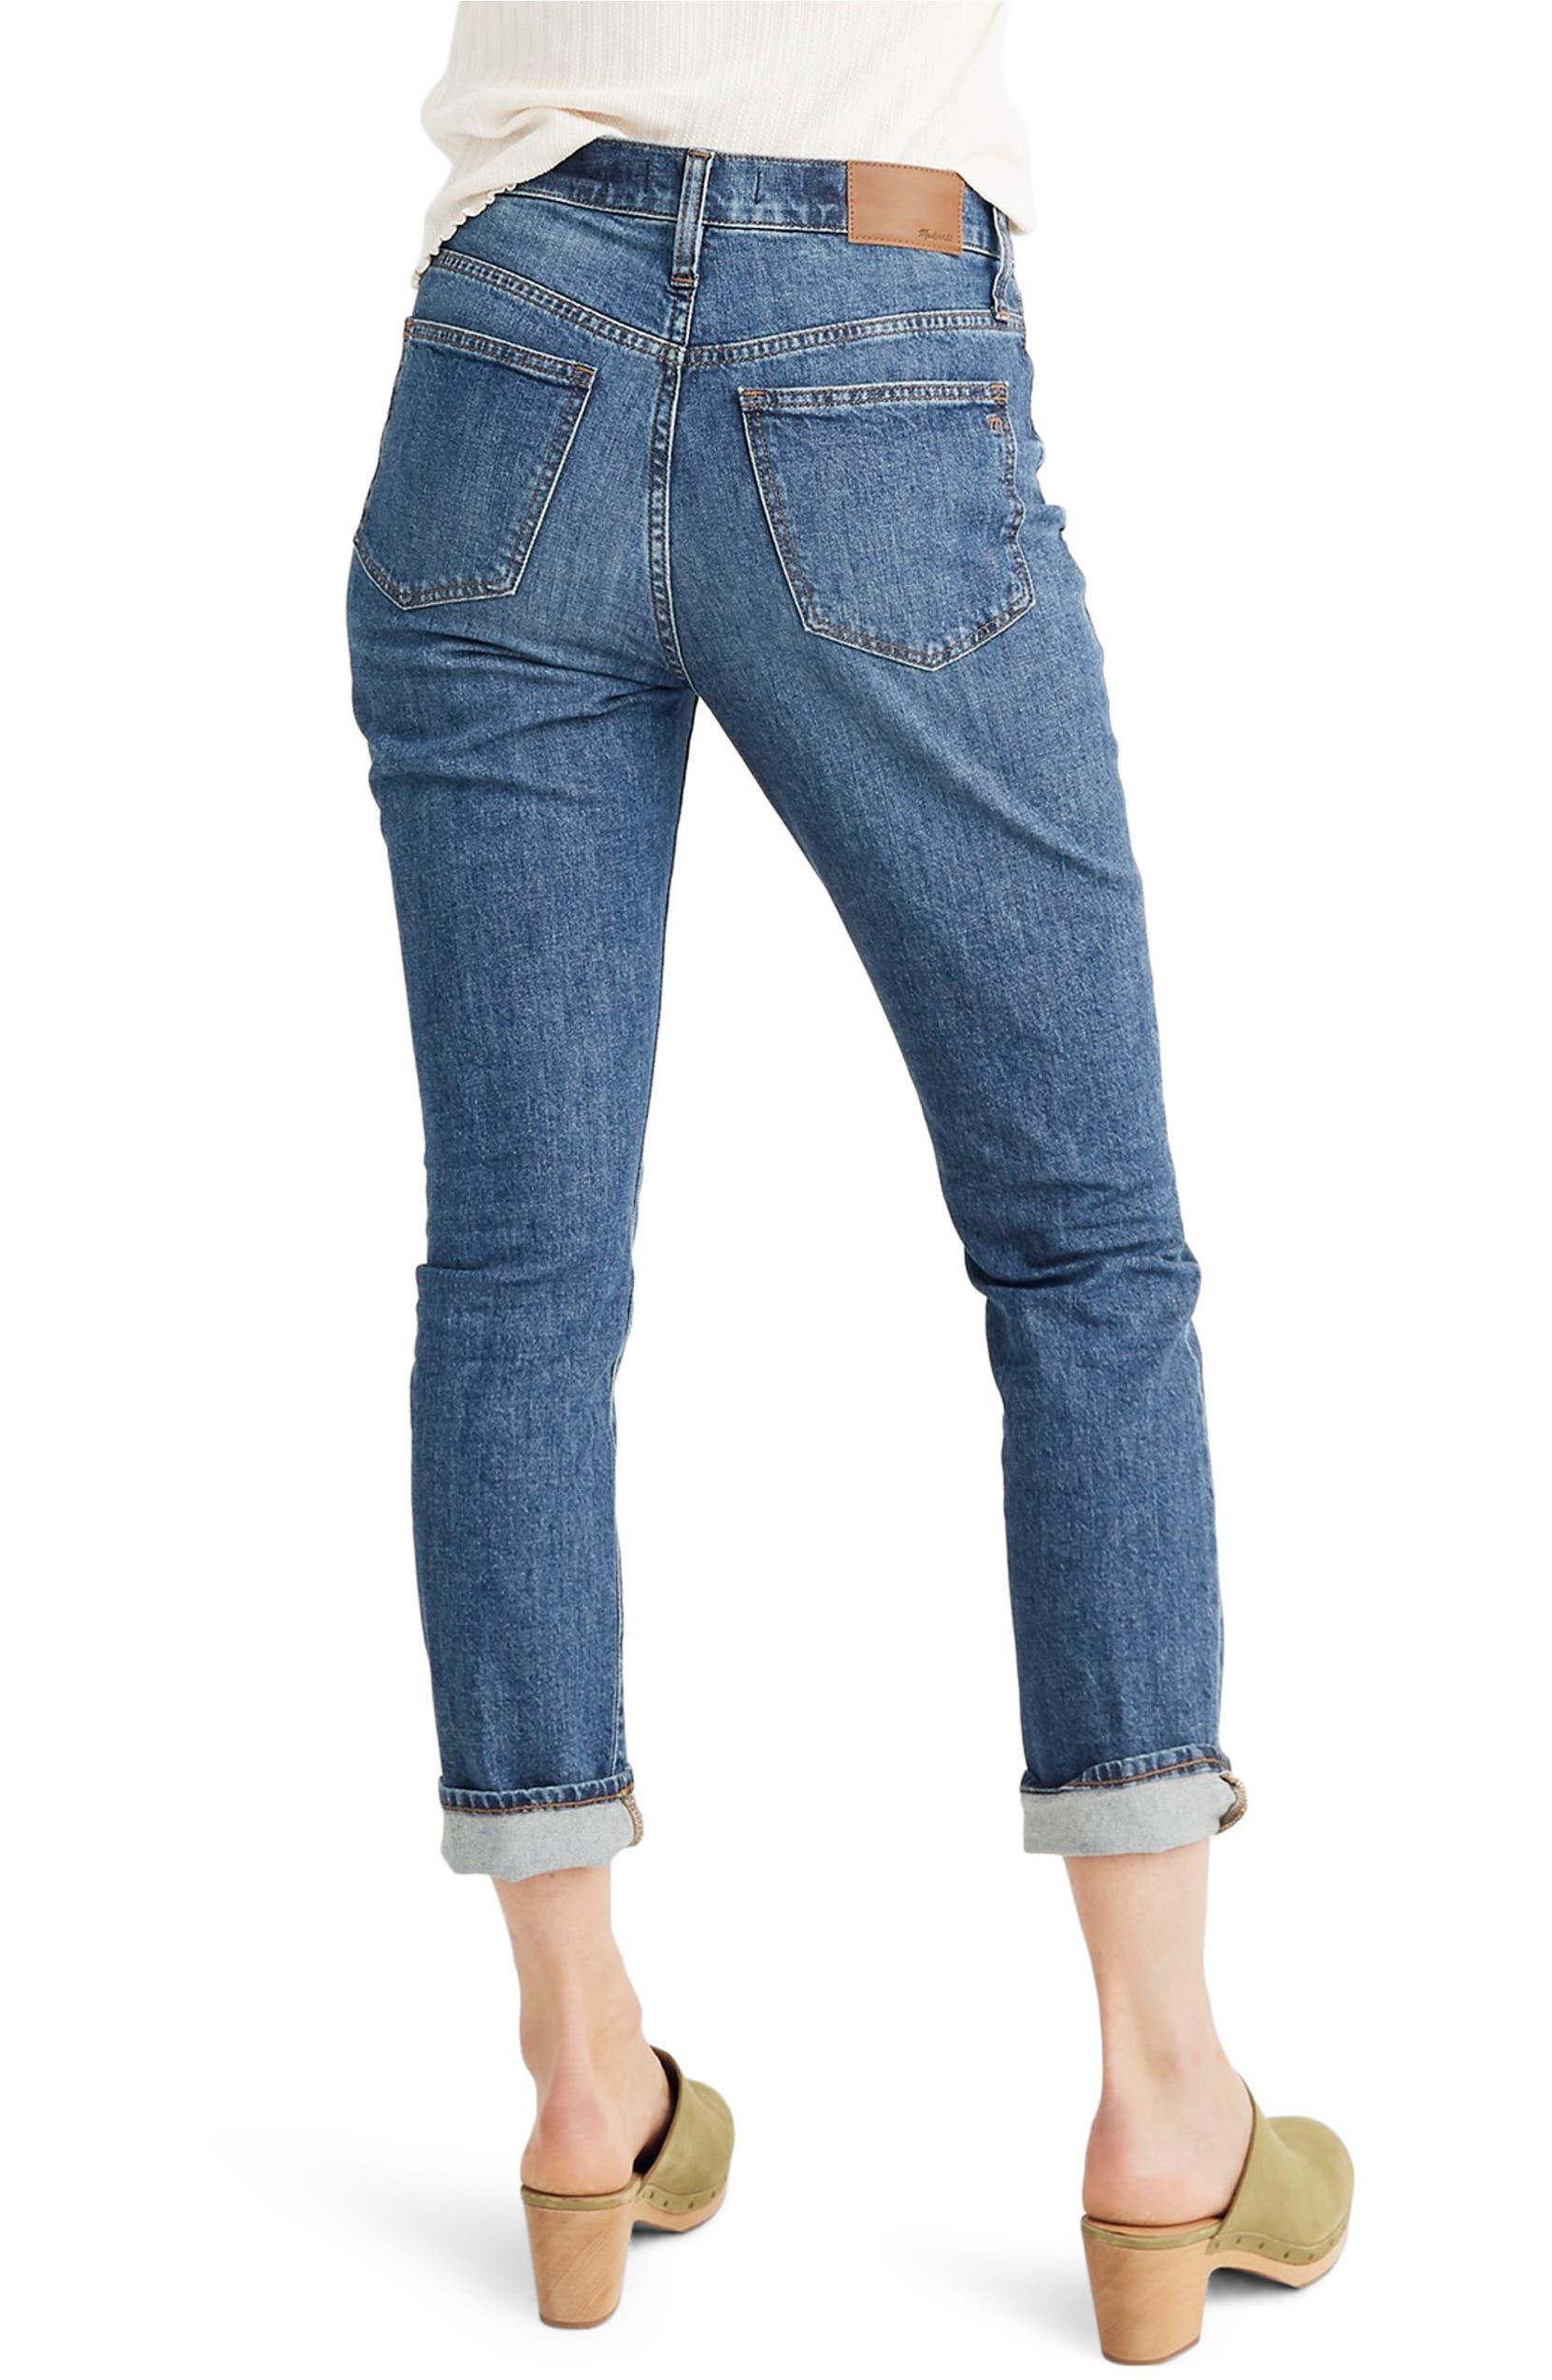 0be201649e0870 Madewell The High Waist Slim Boyjean Boyfriend Jeans (Evangeline) |  Nordstrom